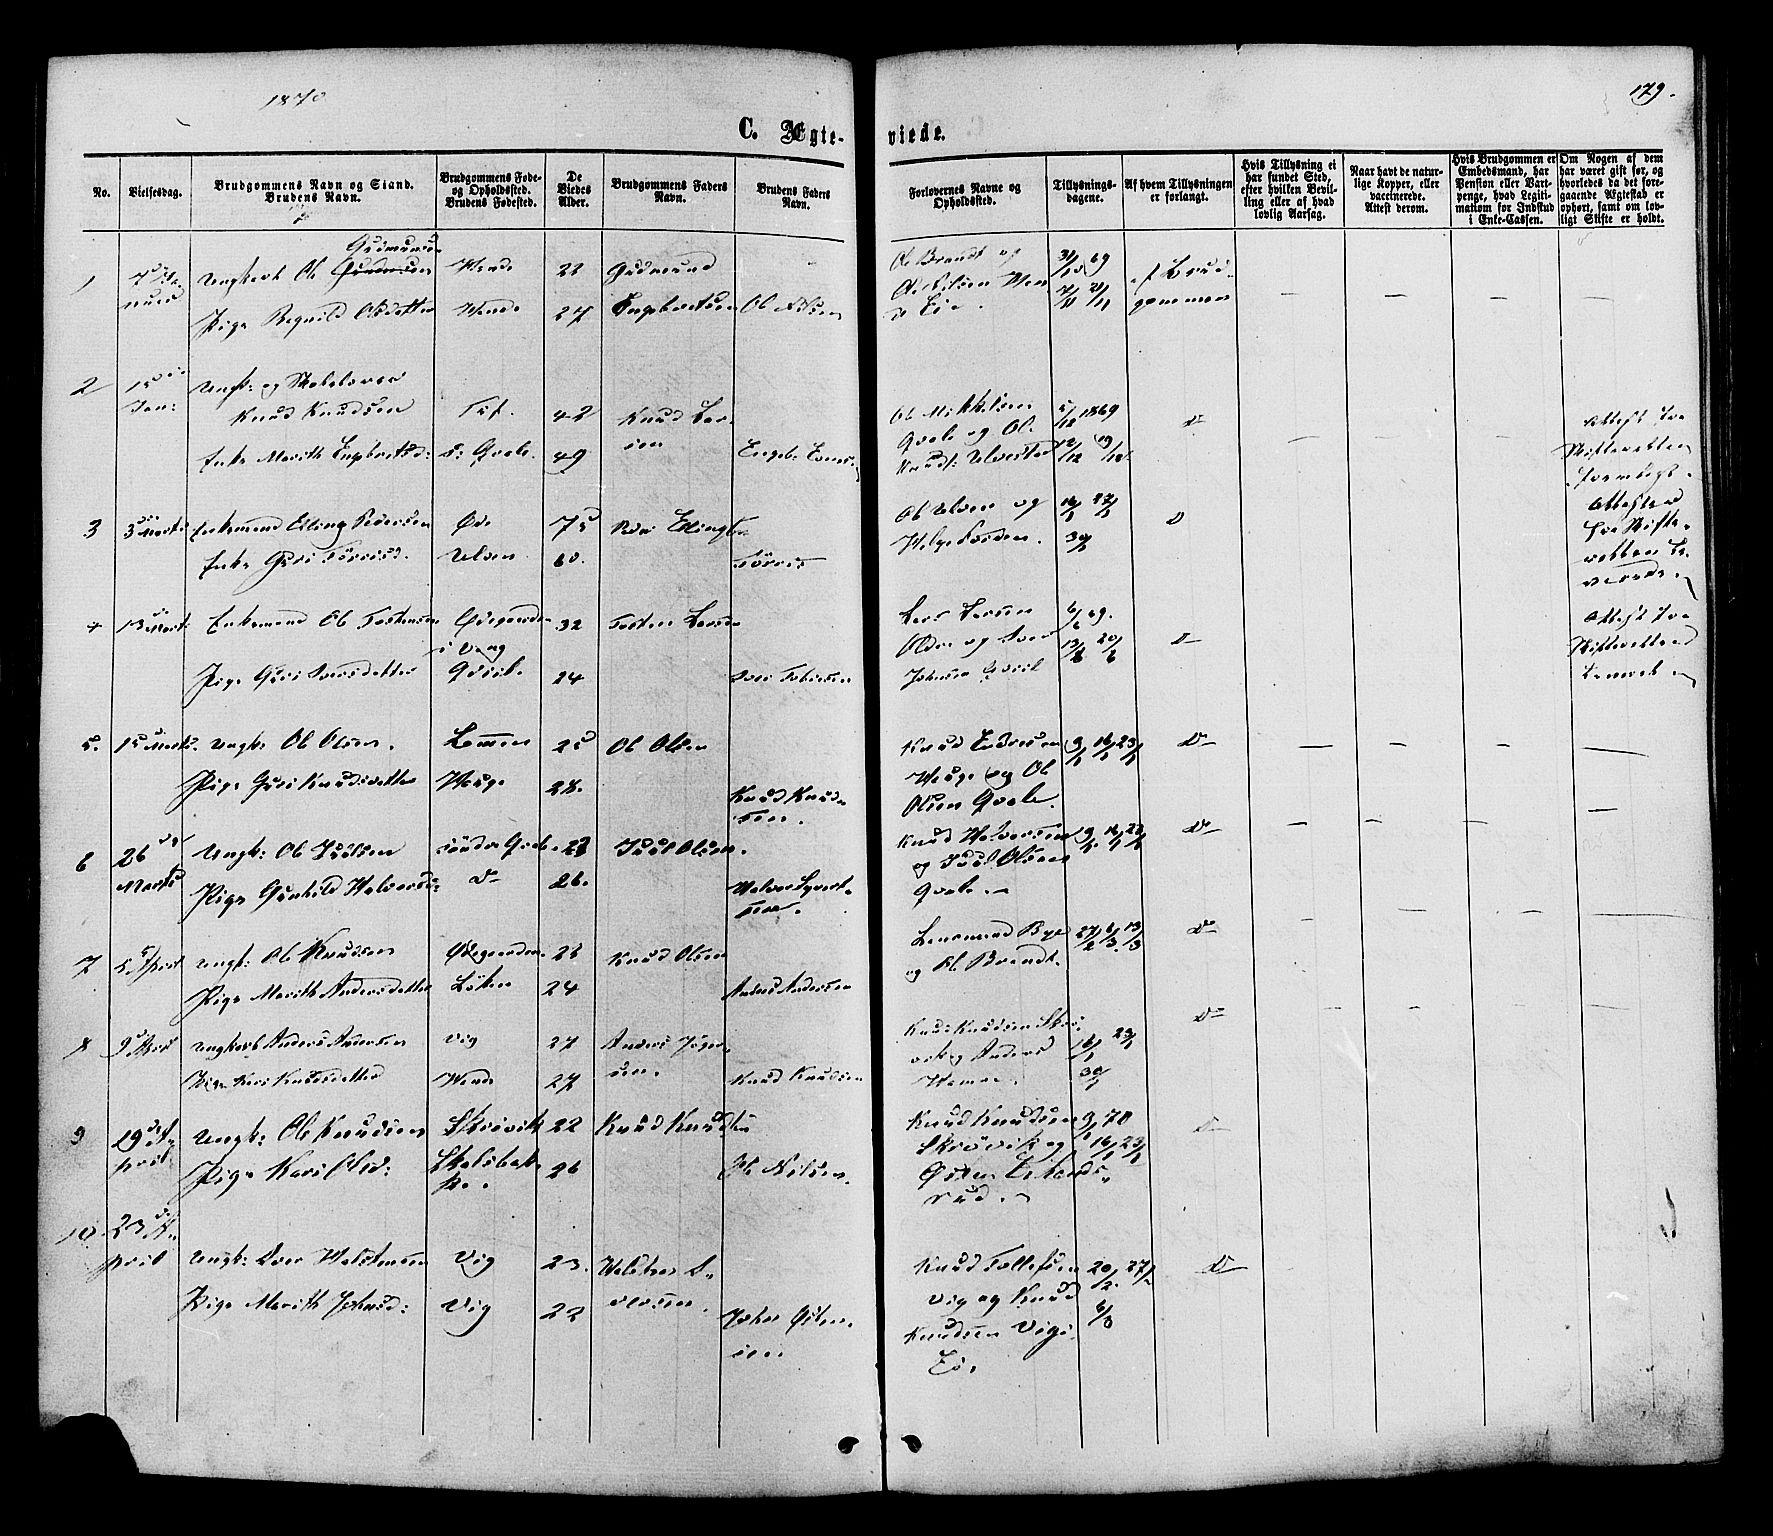 SAH, Vestre Slidre prestekontor, Ministerialbok nr. 3, 1865-1880, s. 179